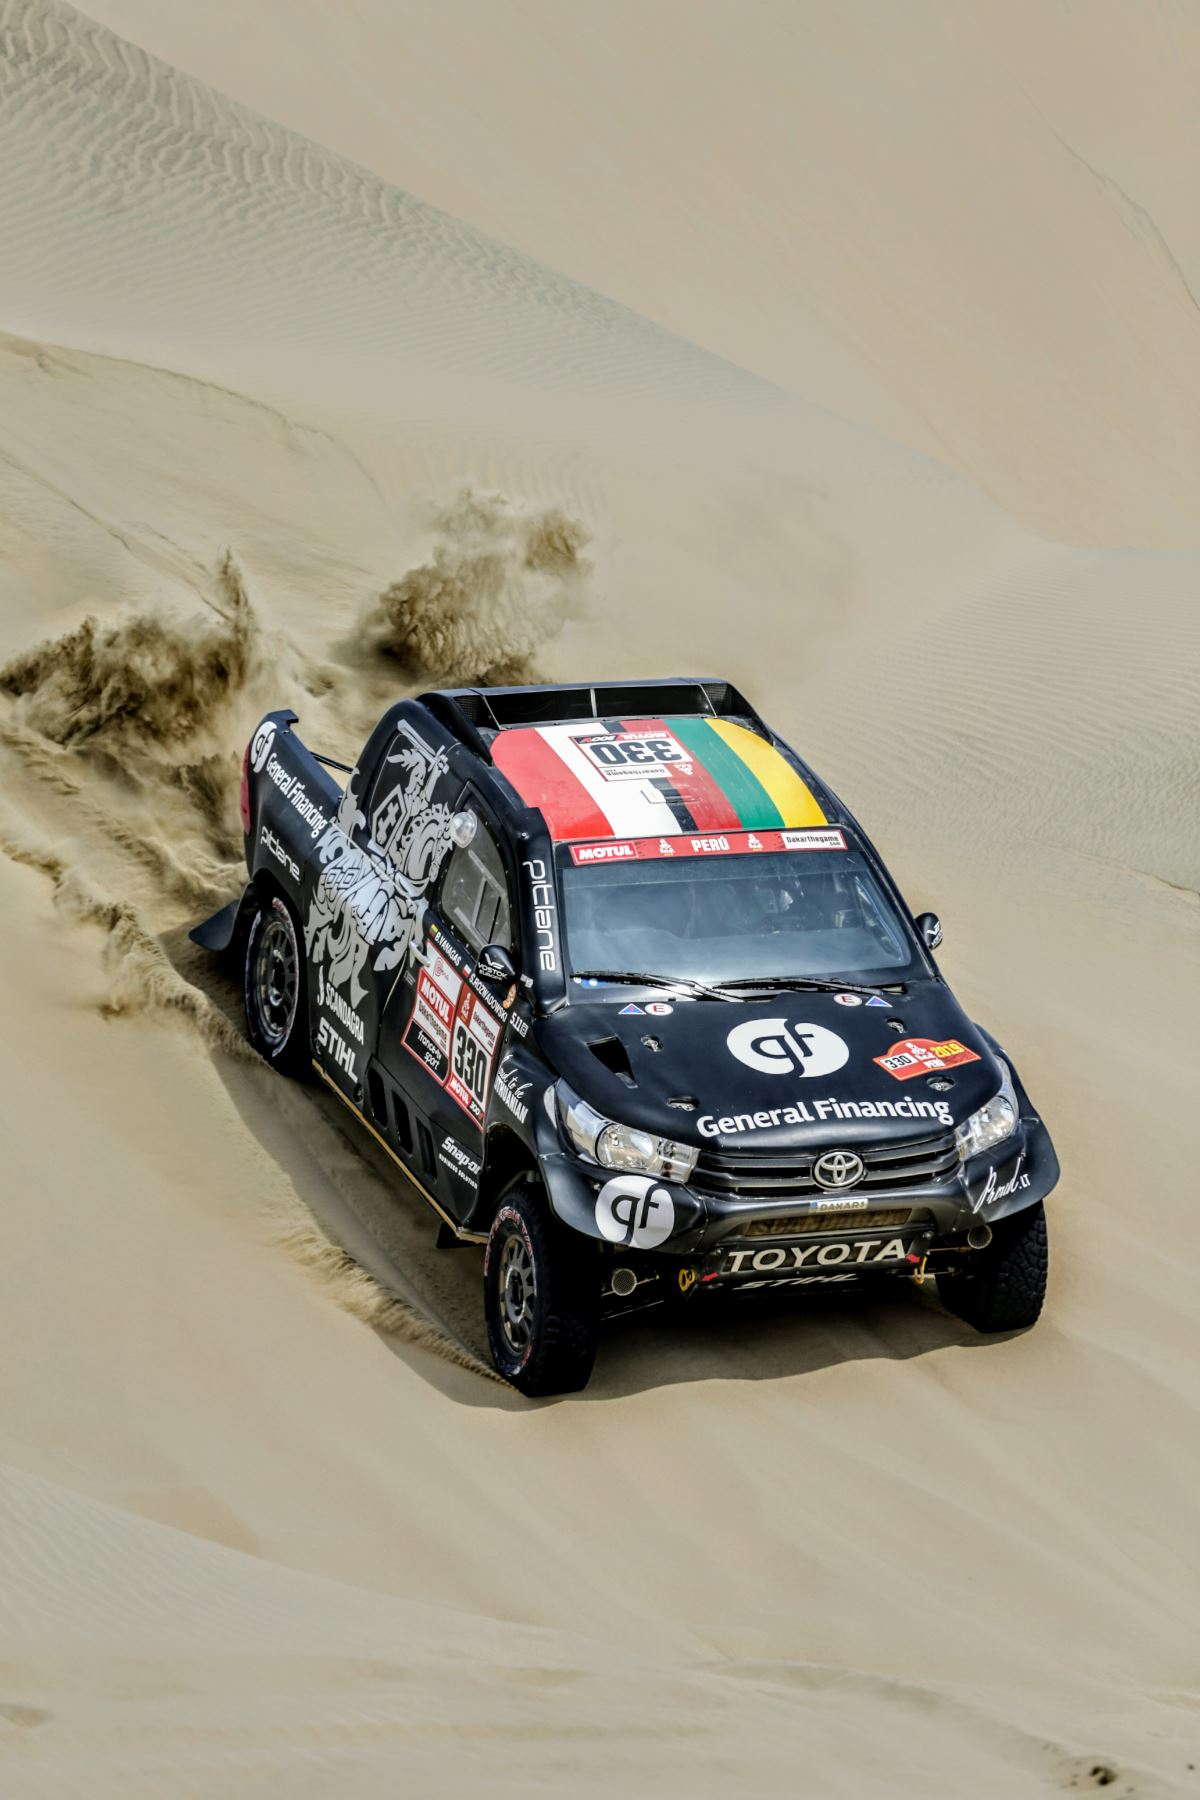 1º etapa de la ruta Marcona, Rally Dakar 2019. Foto: ANDINA/Luis Iparraguirre